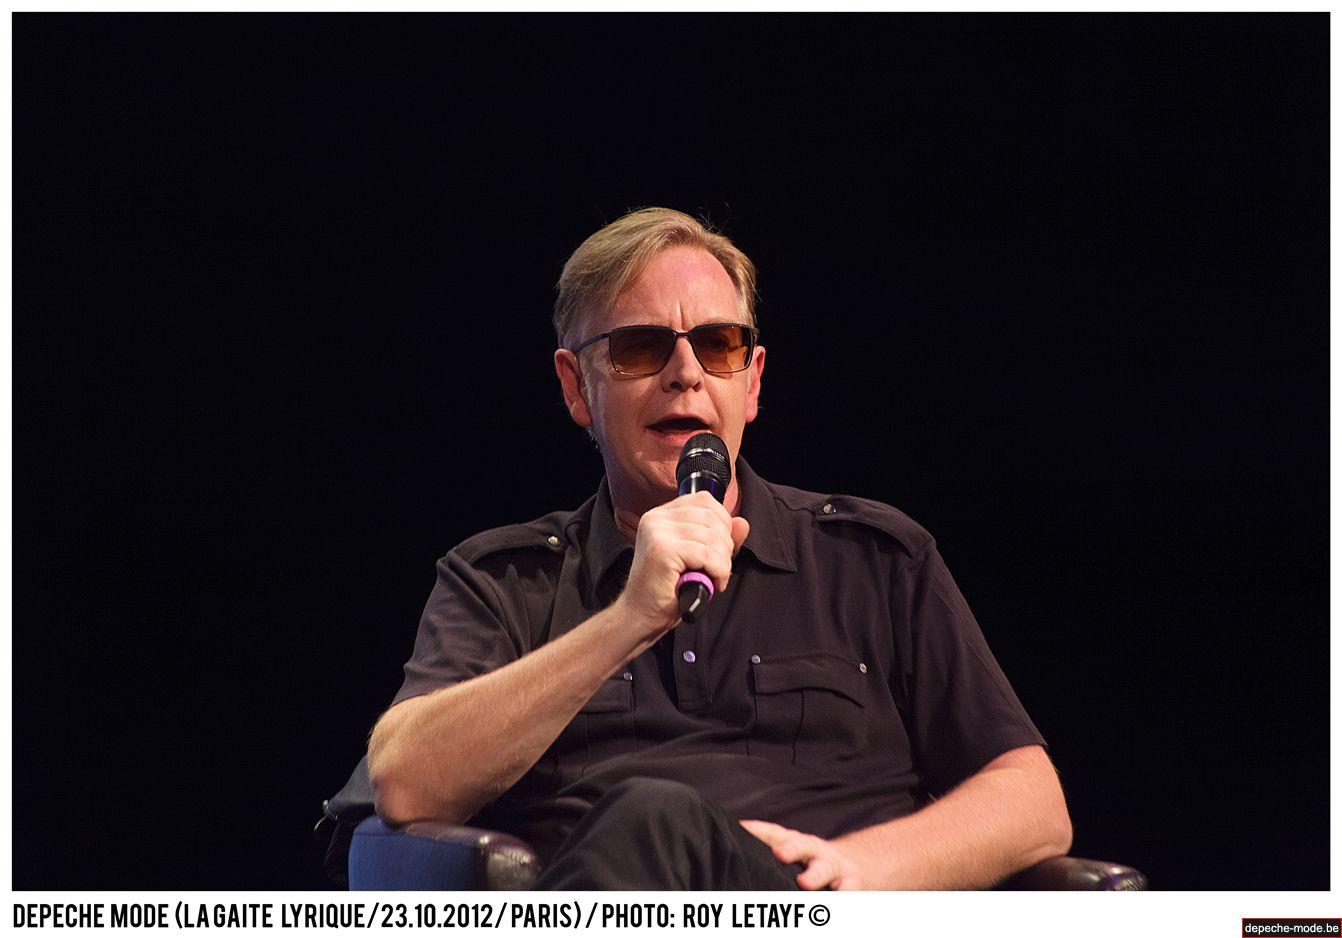 Depeche Mode Paris 23 10 2012 6732 938